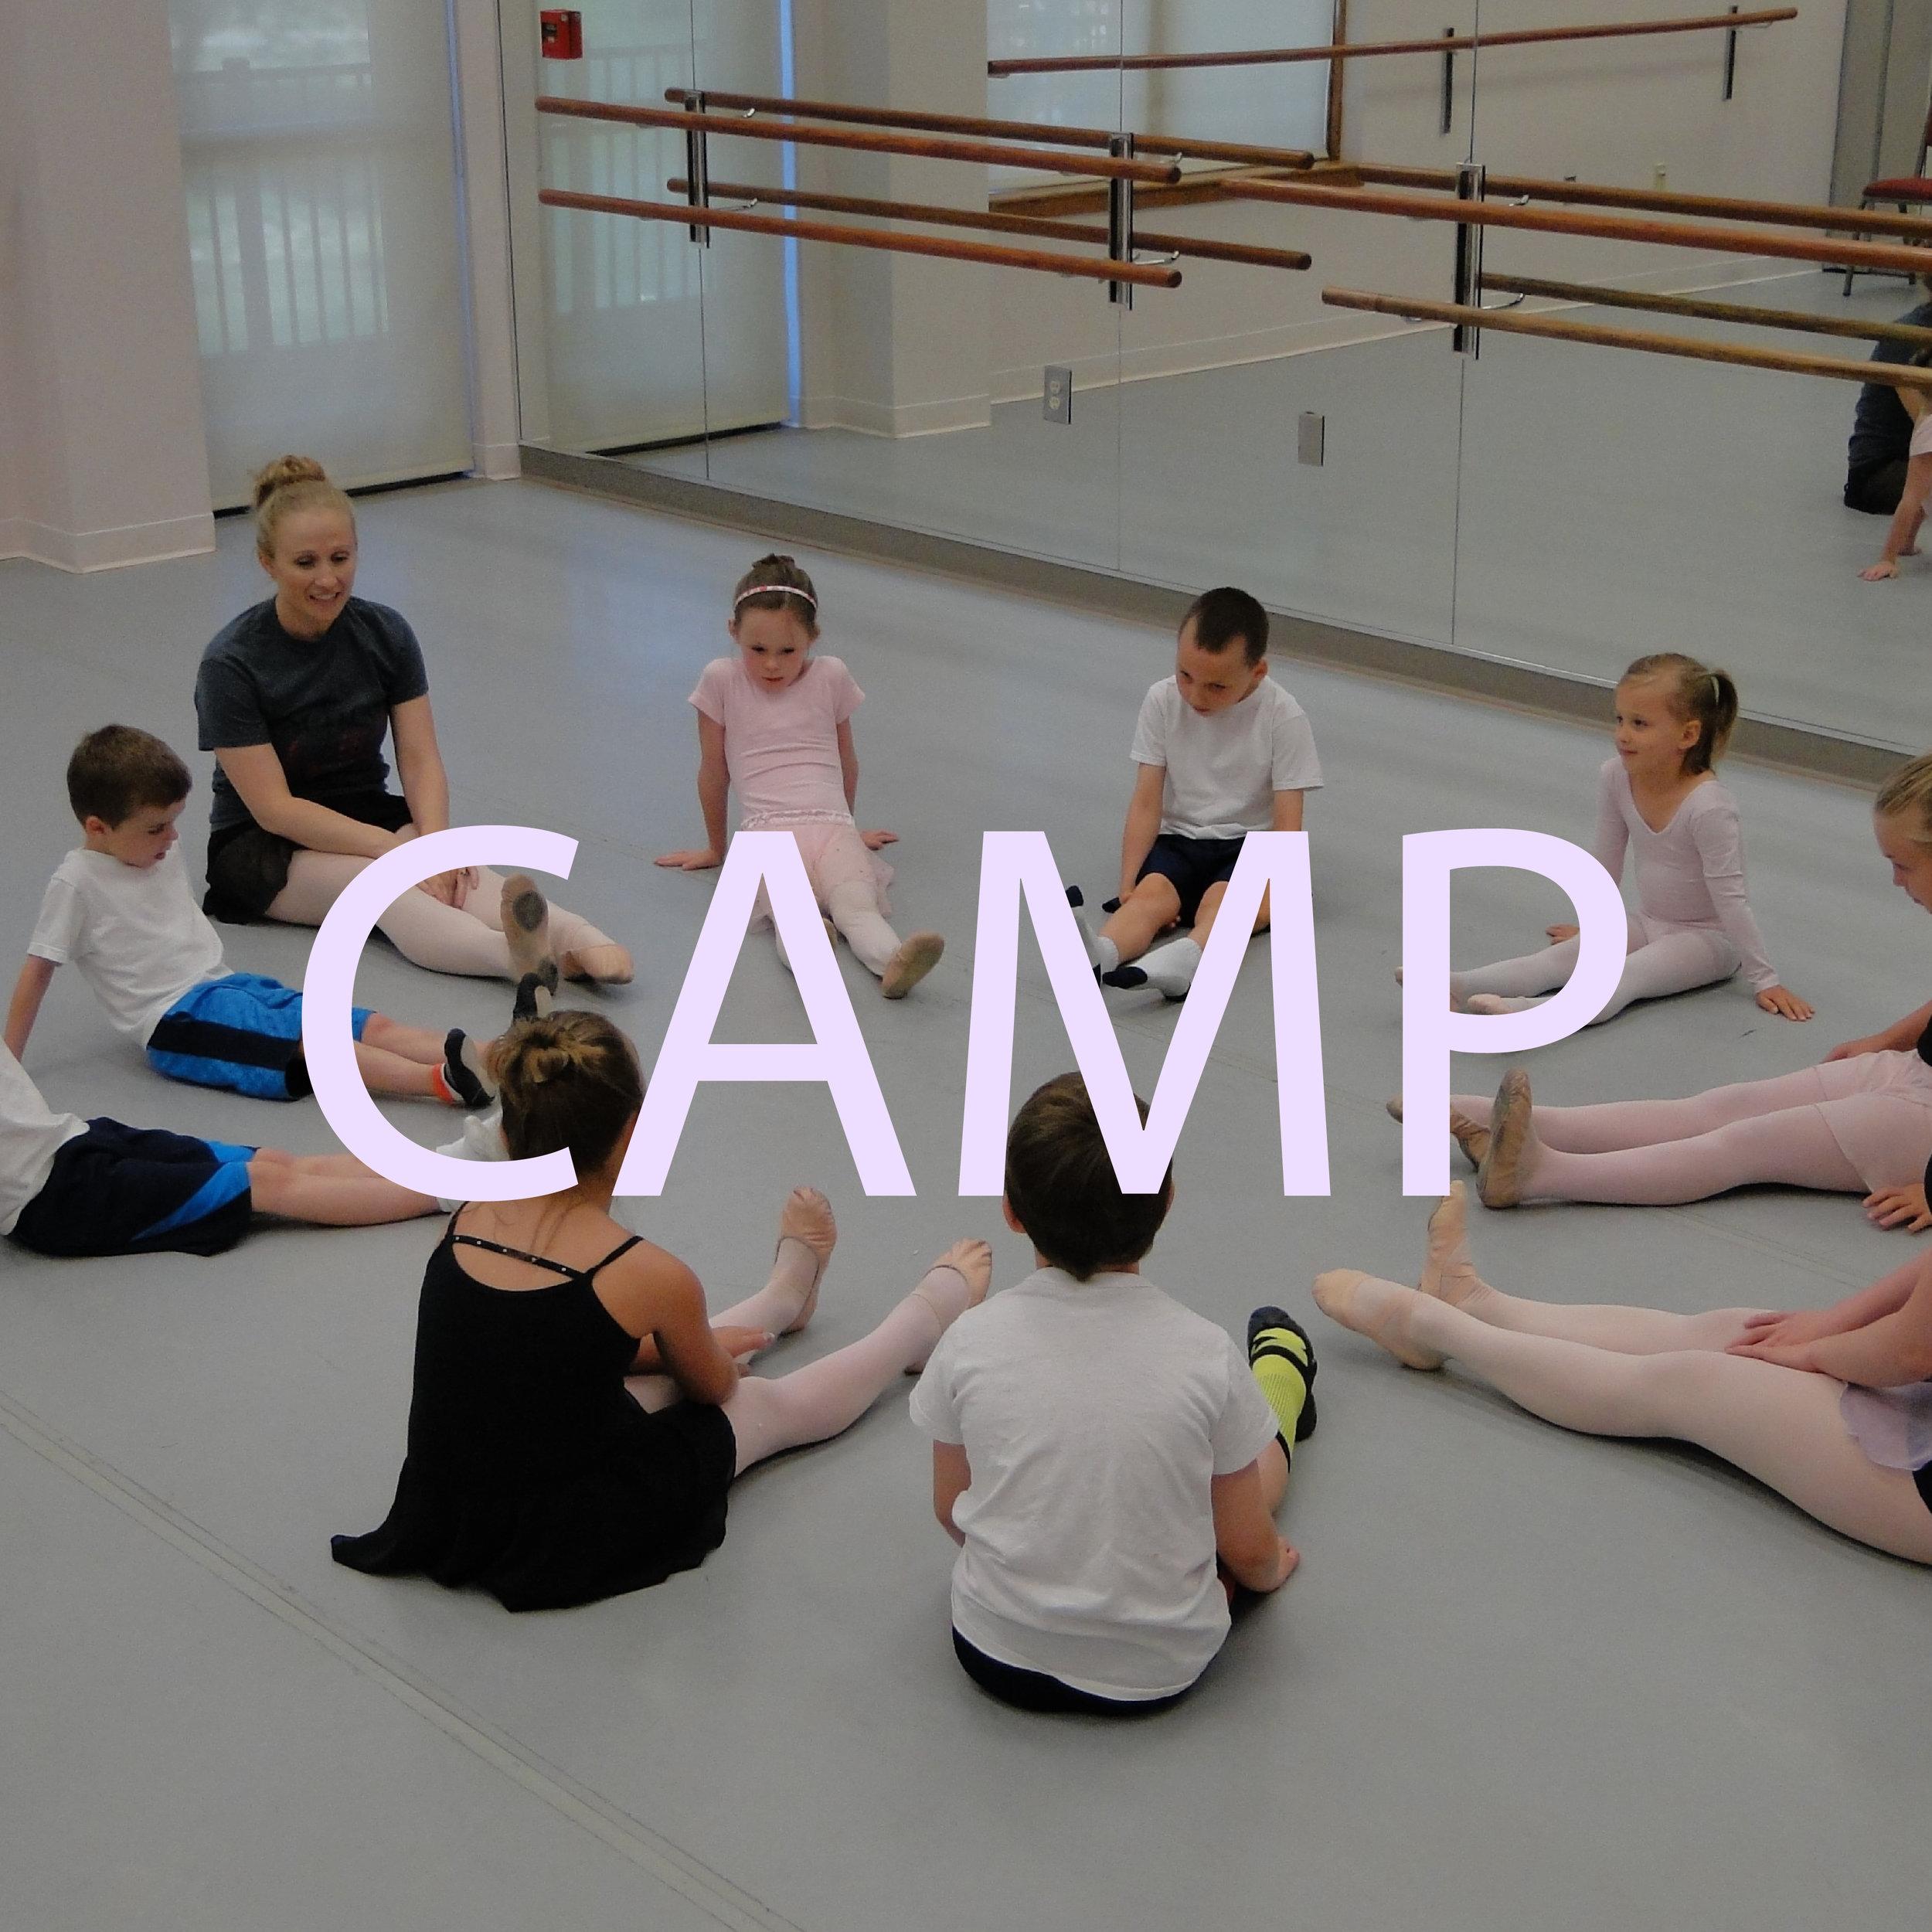 Camp square for website-01.jpg